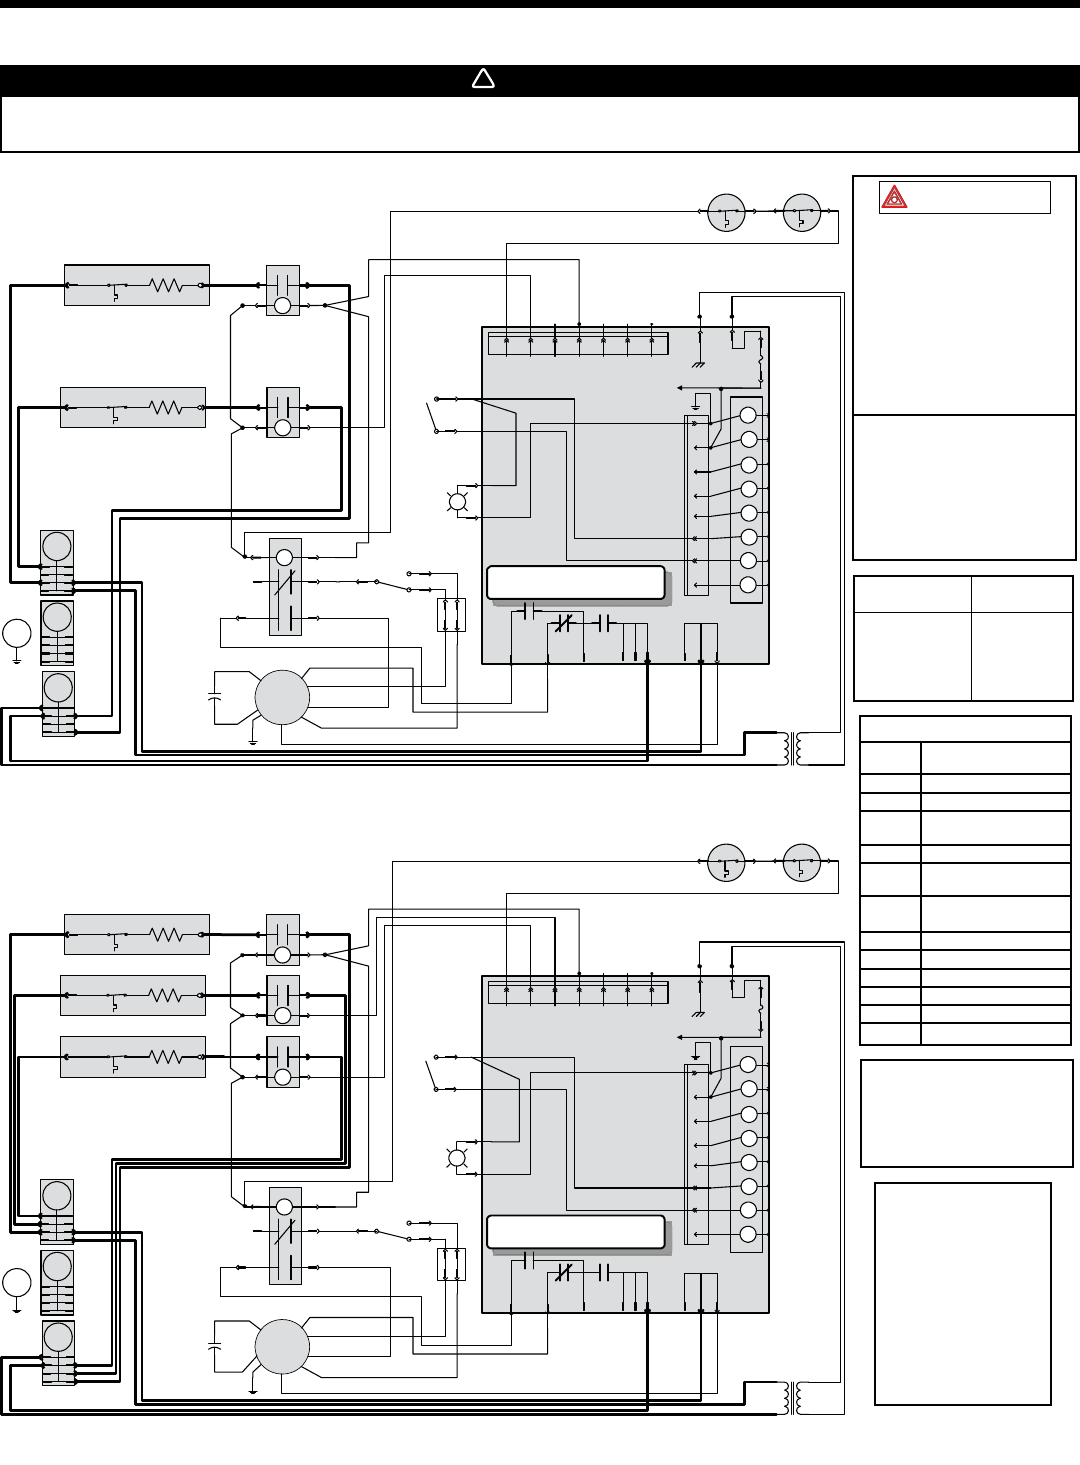 Open Range Wiring Diagram Auto Electrical Broan 154b